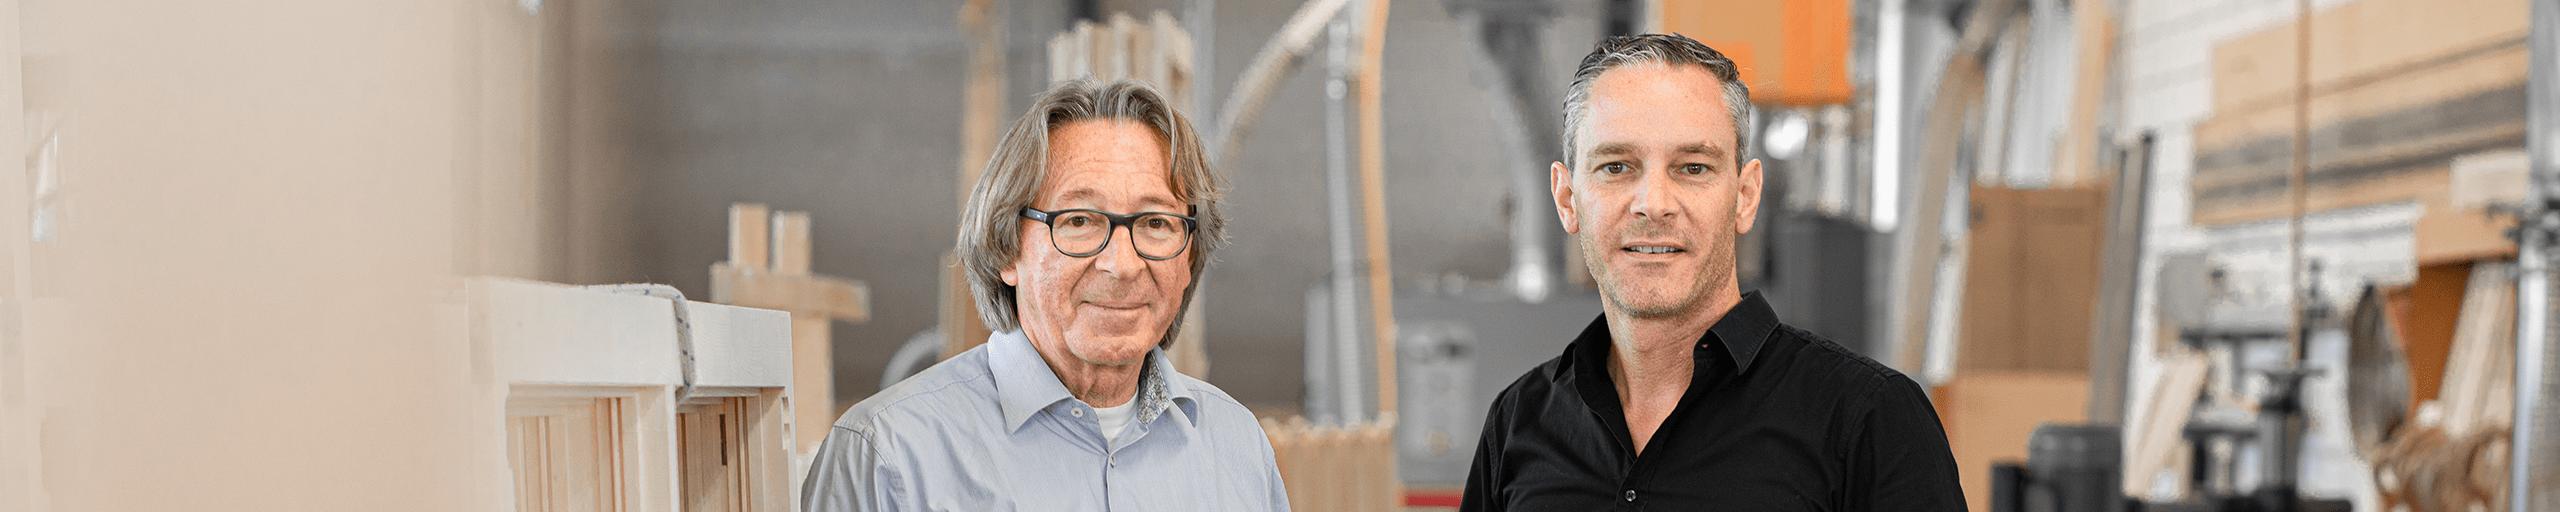 Photo Sepp Schmid et Raffael Schmid, Schmid Fenster Manufaktur